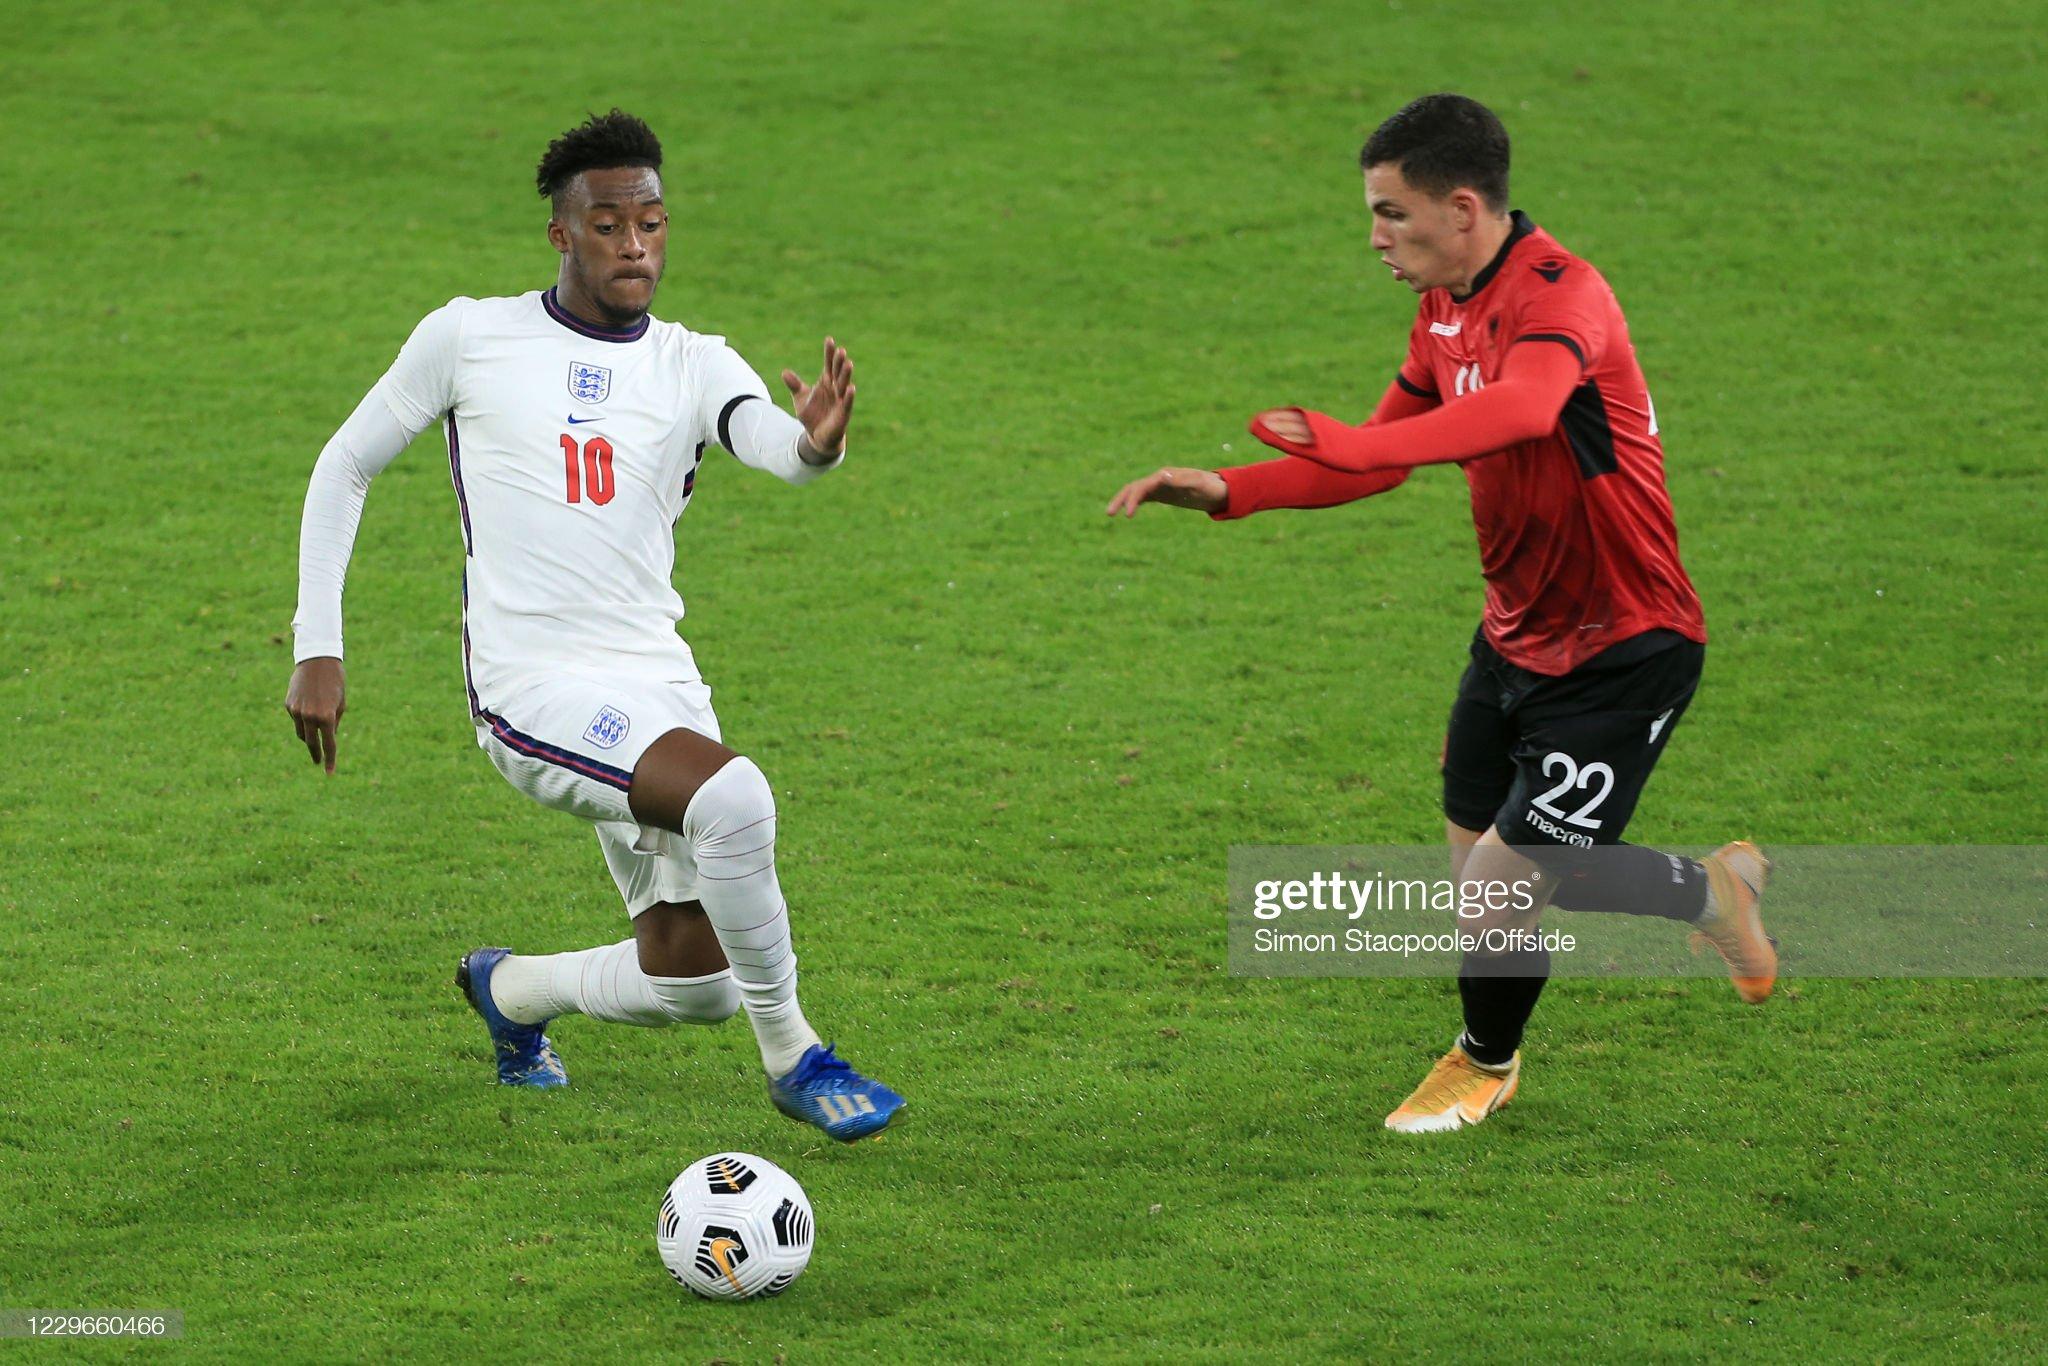 Albania vs England preview, prediction and odds